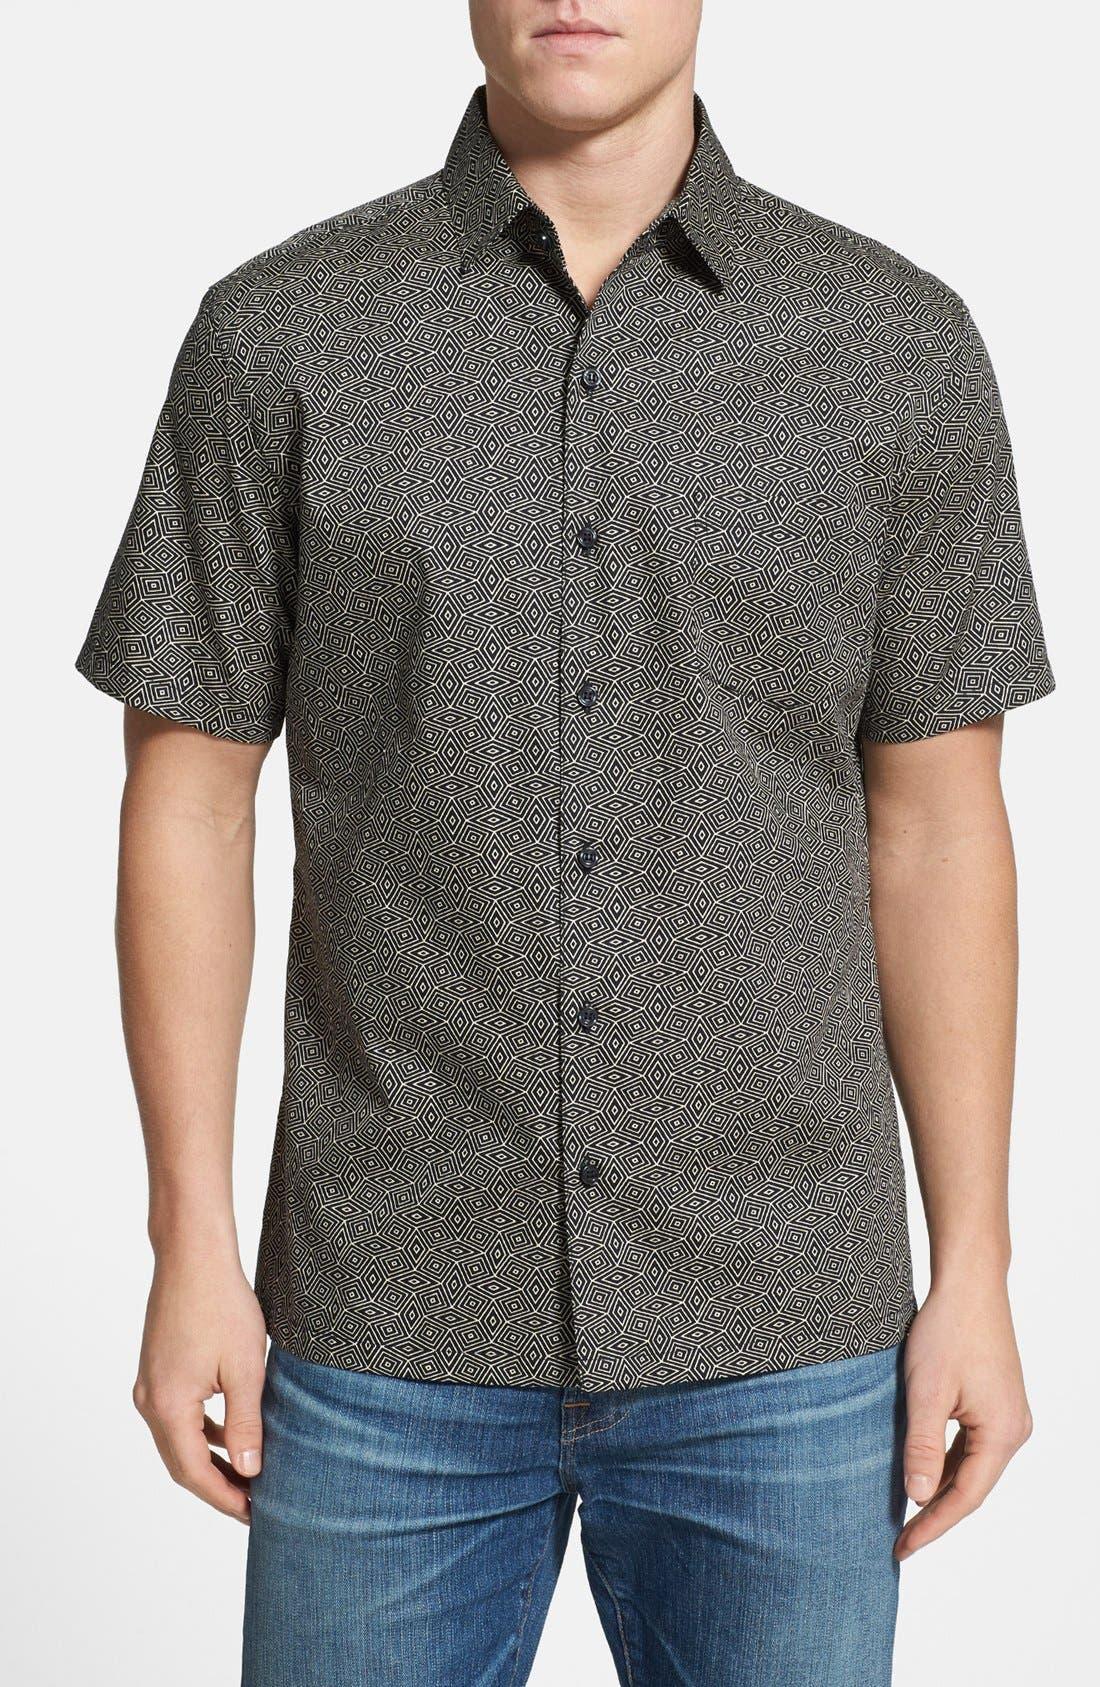 Alternate Image 1 Selected - Tori Richard 'Hypnoweave' Classic Fit Sport Shirt